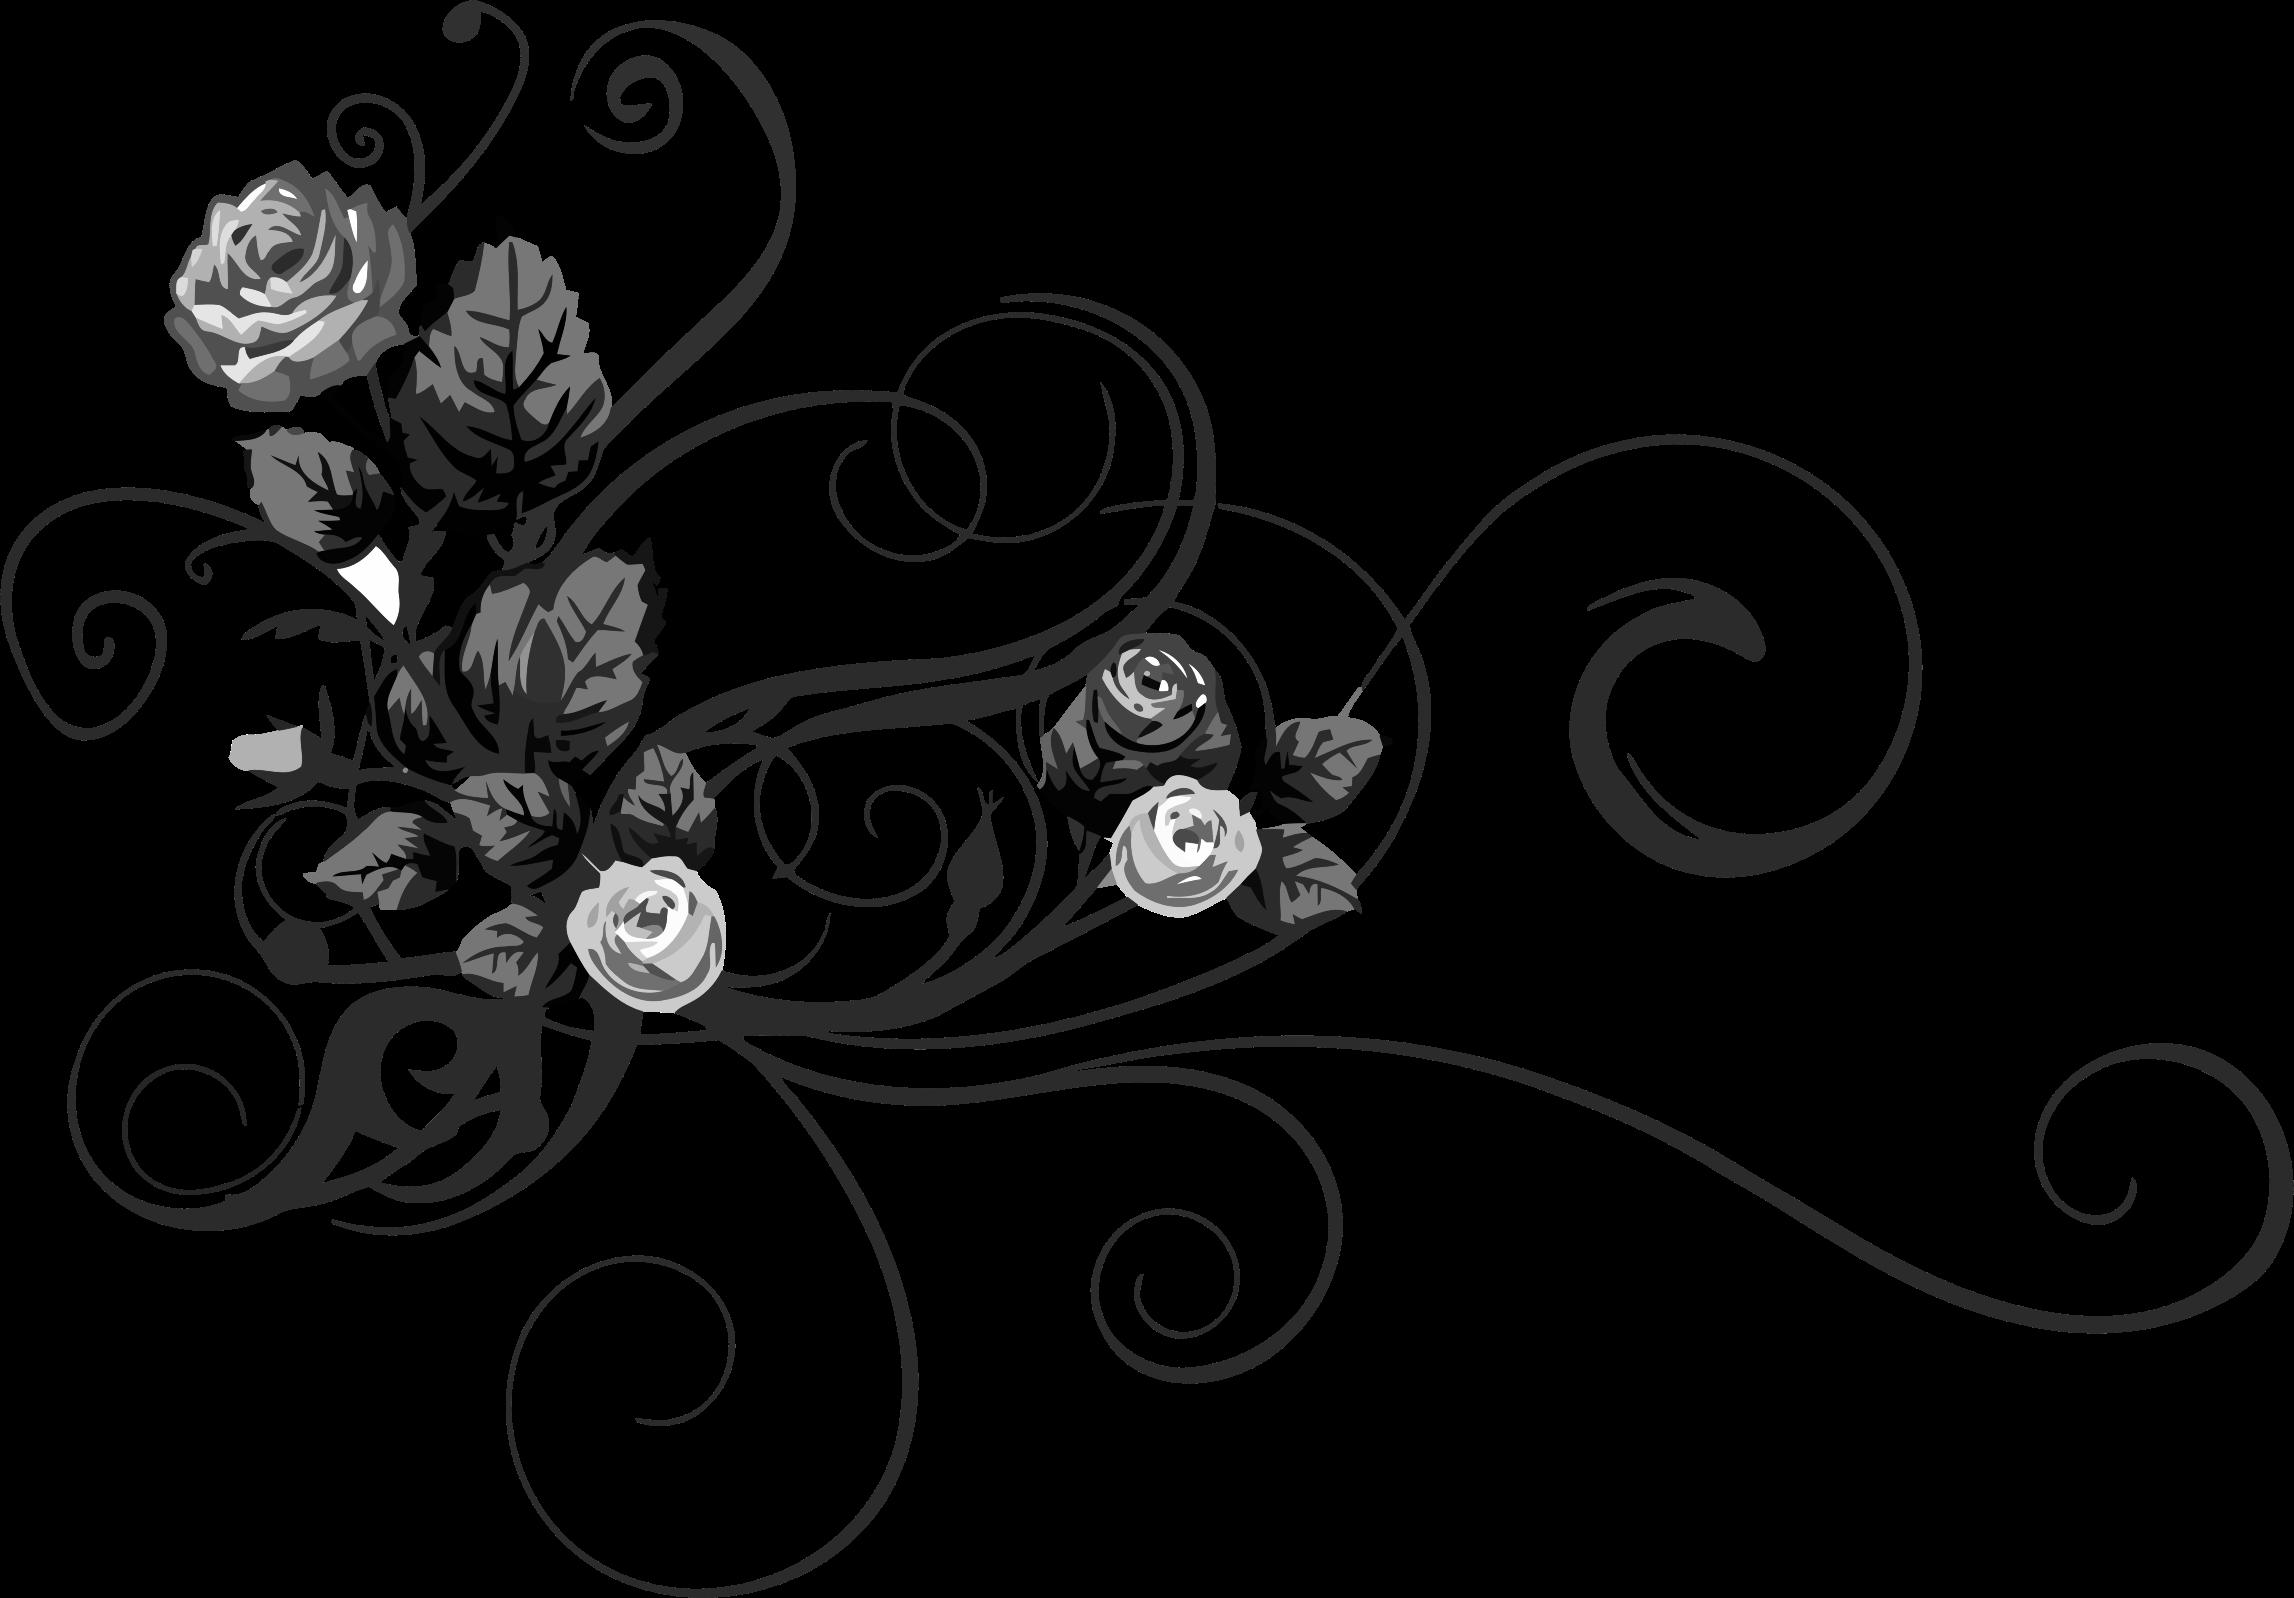 Rose floral big image. Flower flourish clipart